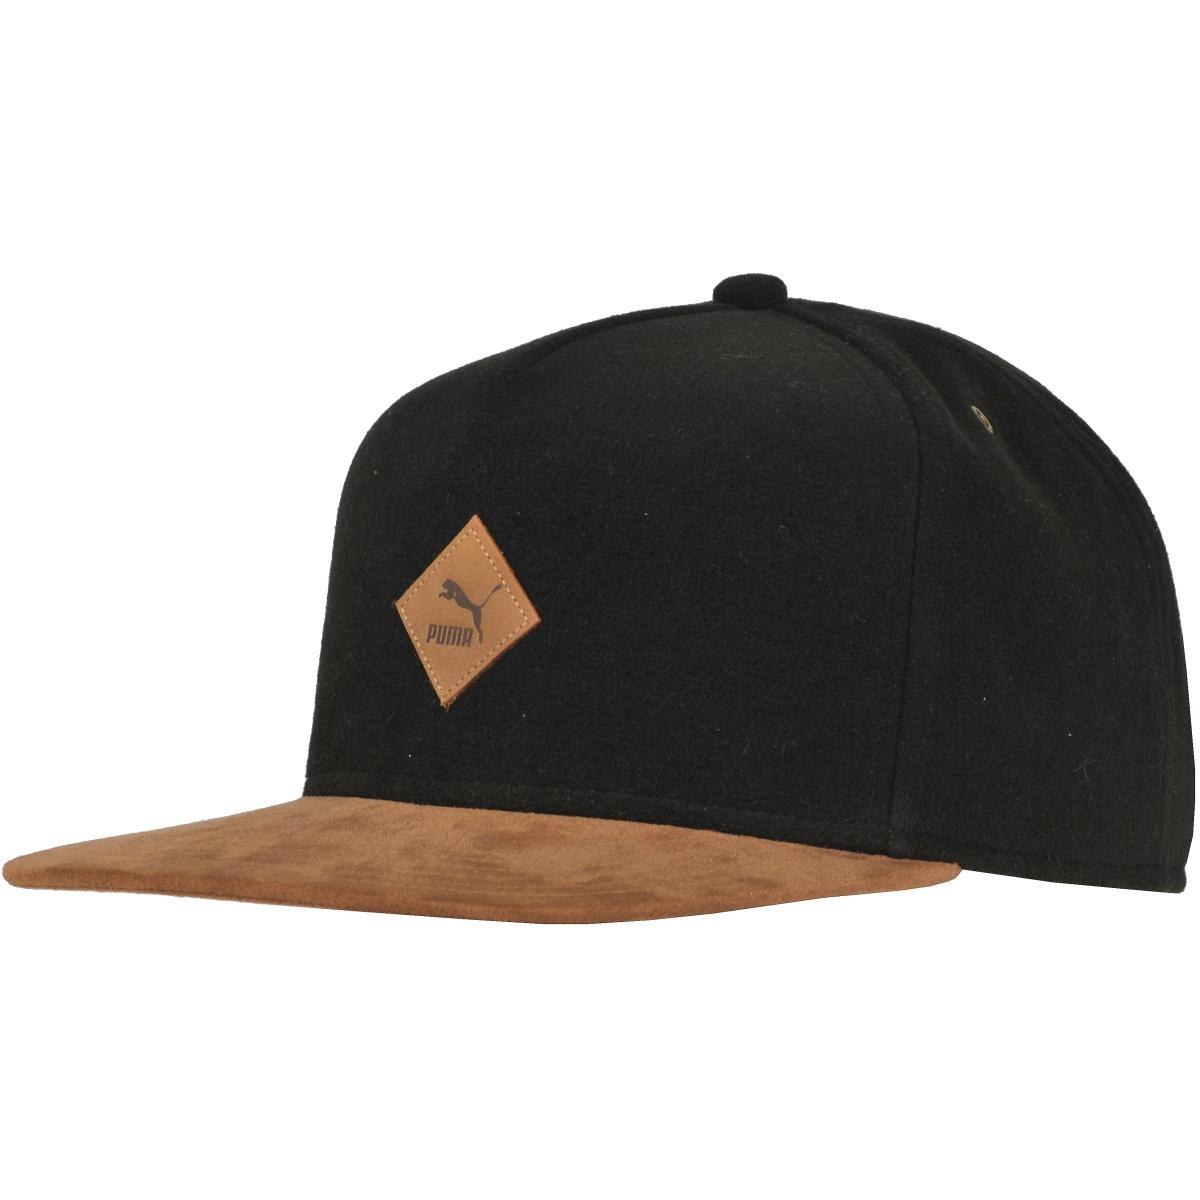 Puma Wool Flatbrim Cap černá Jednotná - Glami.cz 2fc01e918476